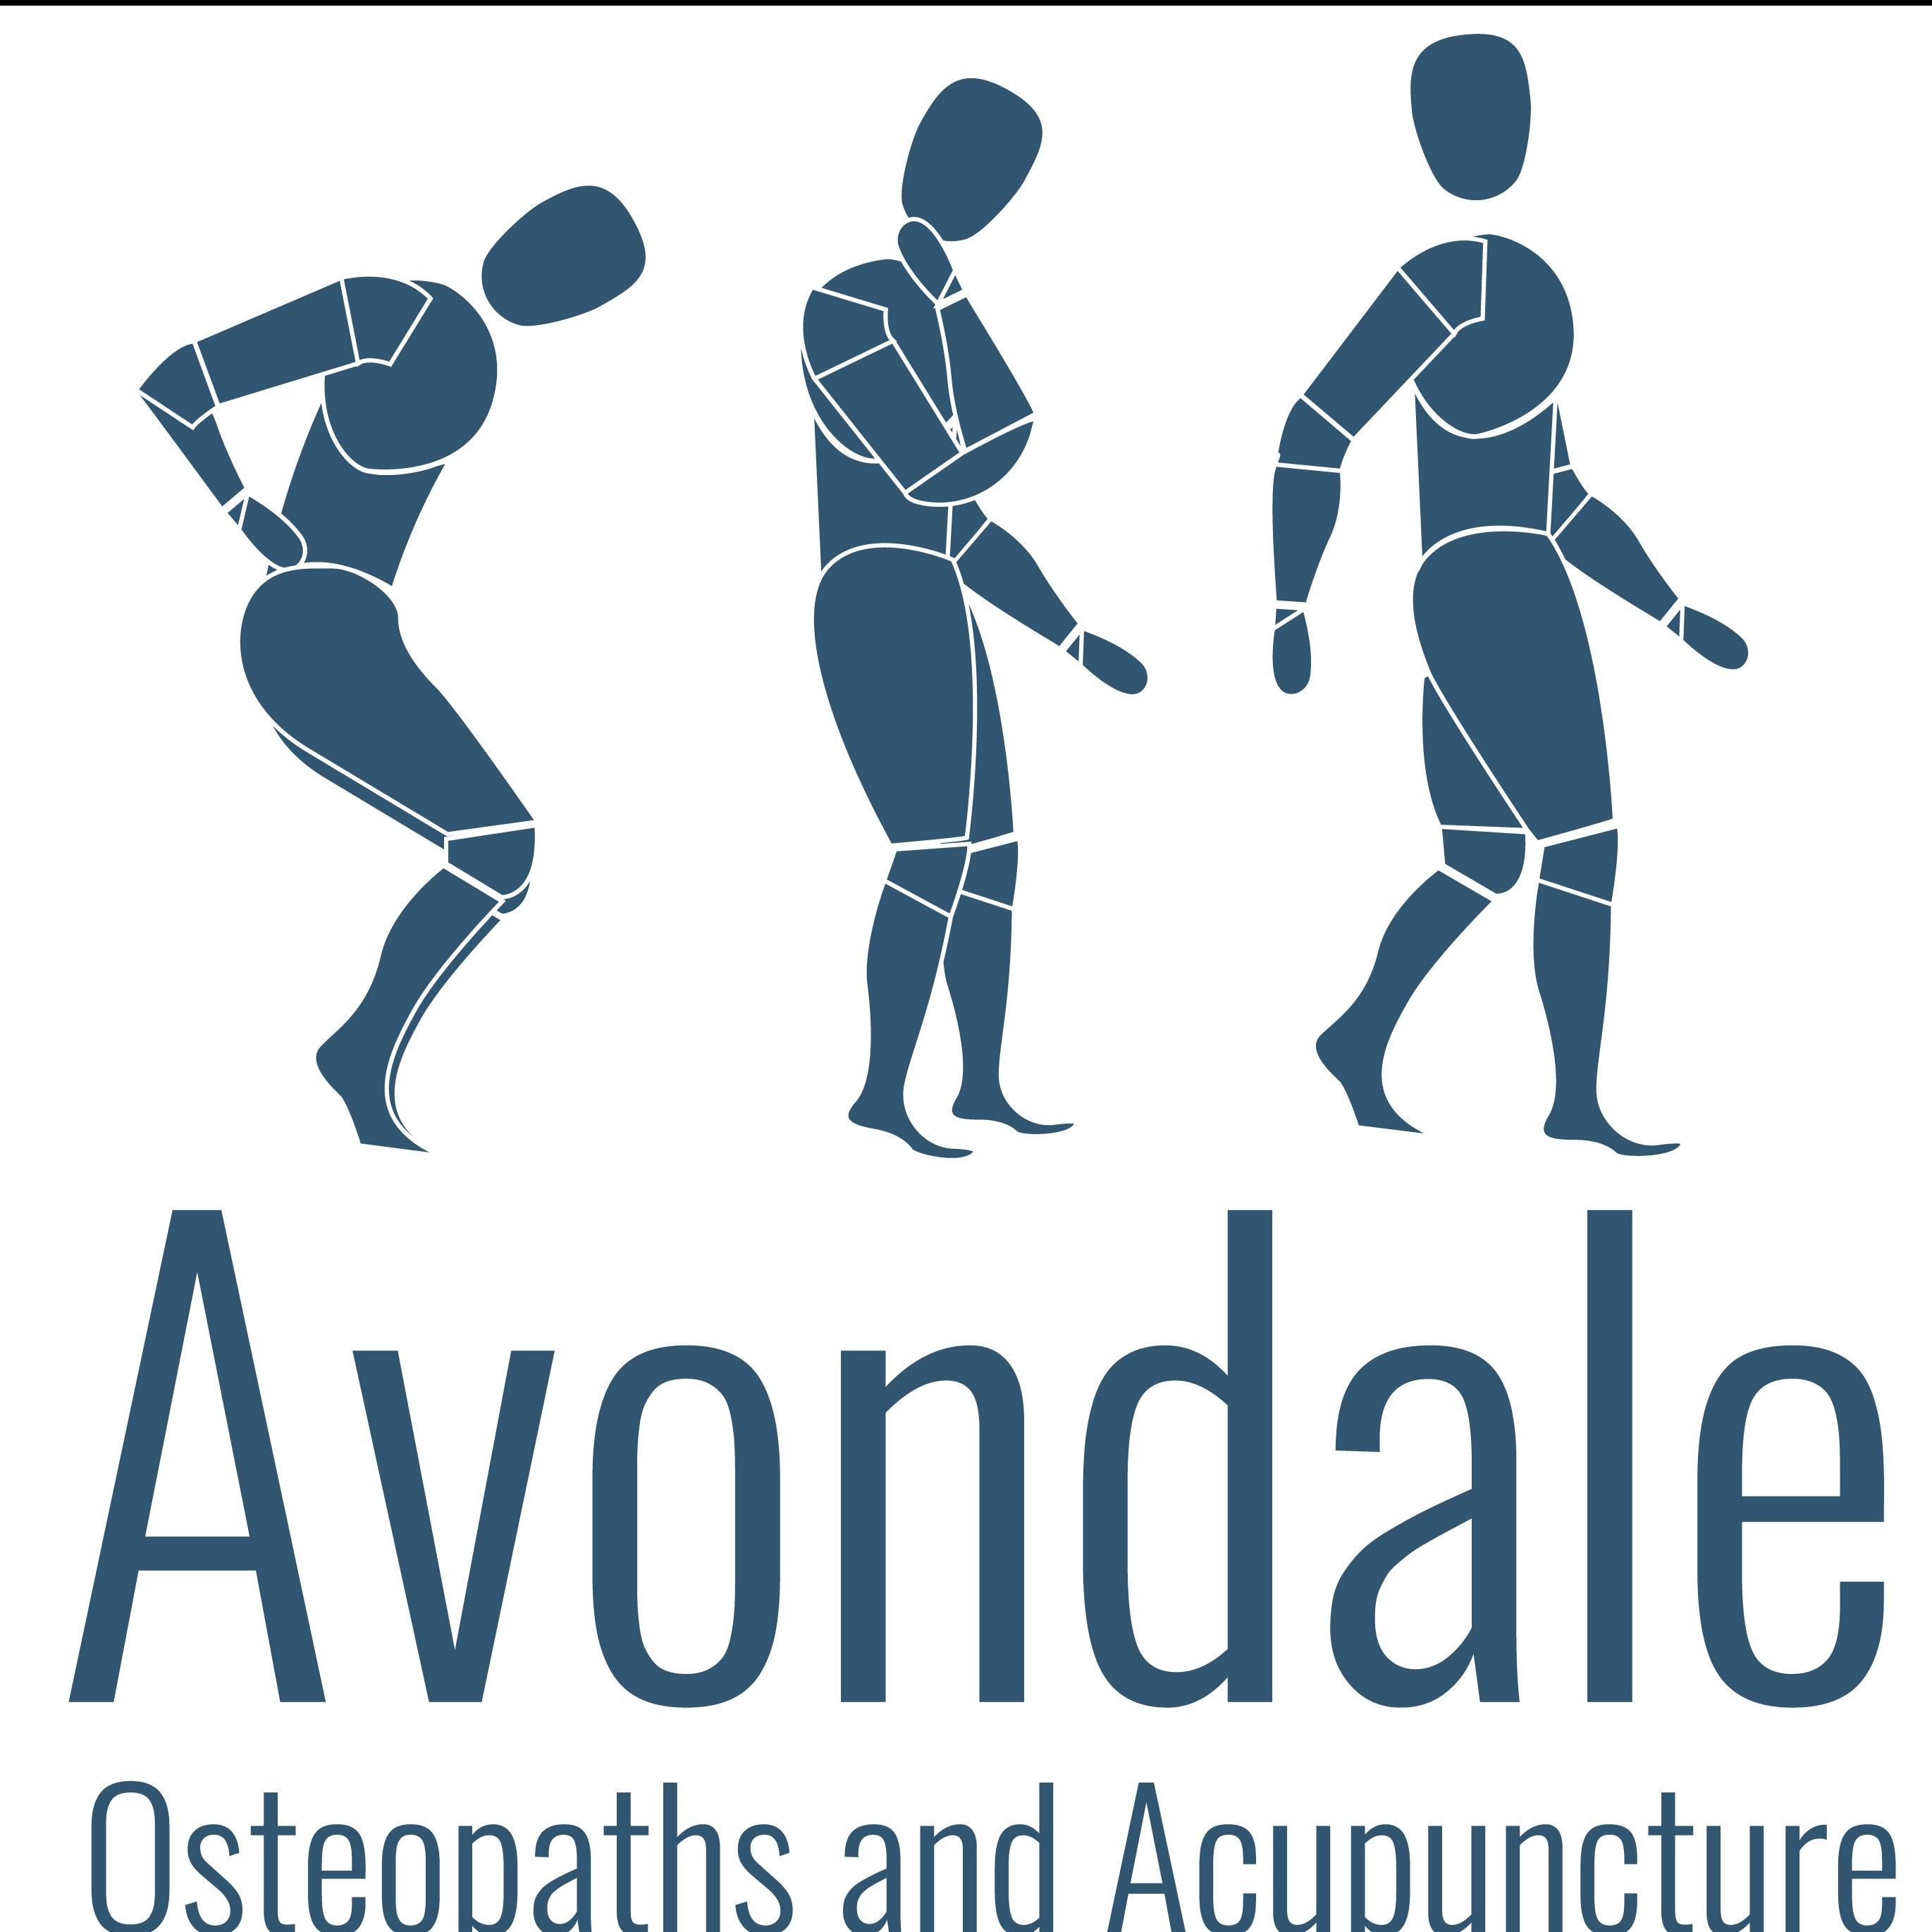 Avondale Osteopaths